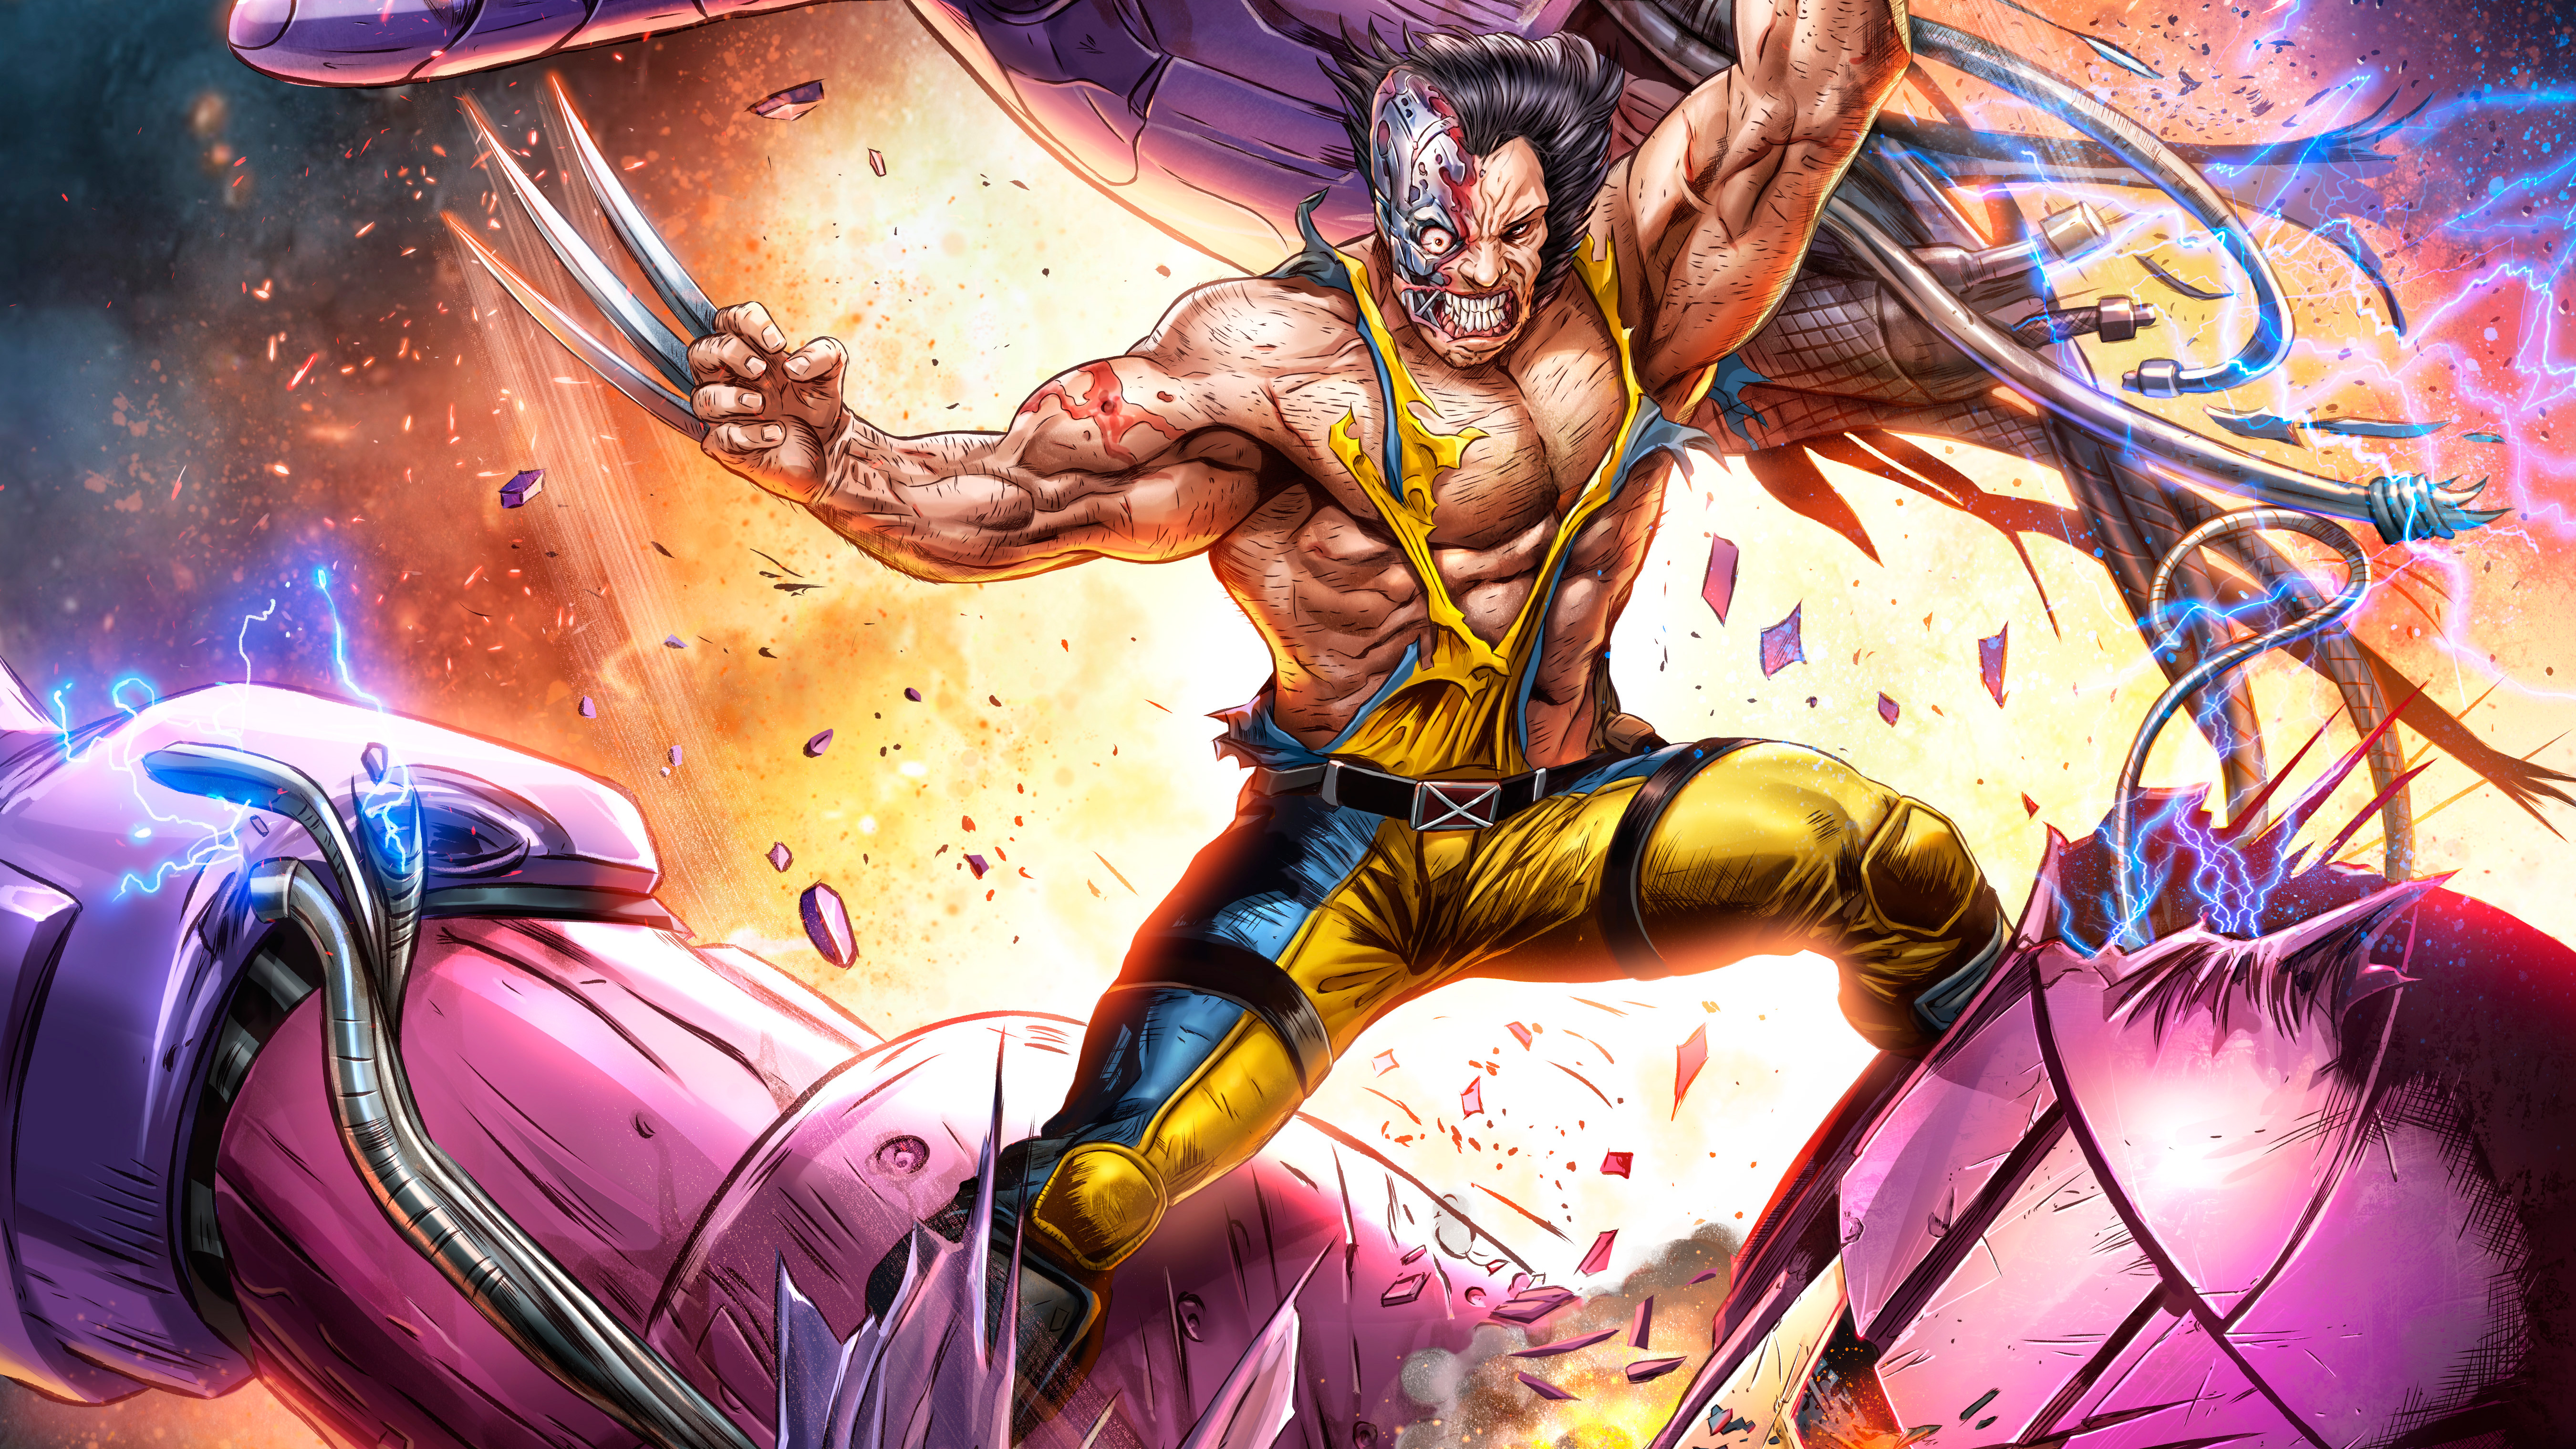 Wolverine vs sentinel artwork 5k hd superheroes 4k wallpapers images backgrounds photos and - Wallpaper wolverine 4k ...